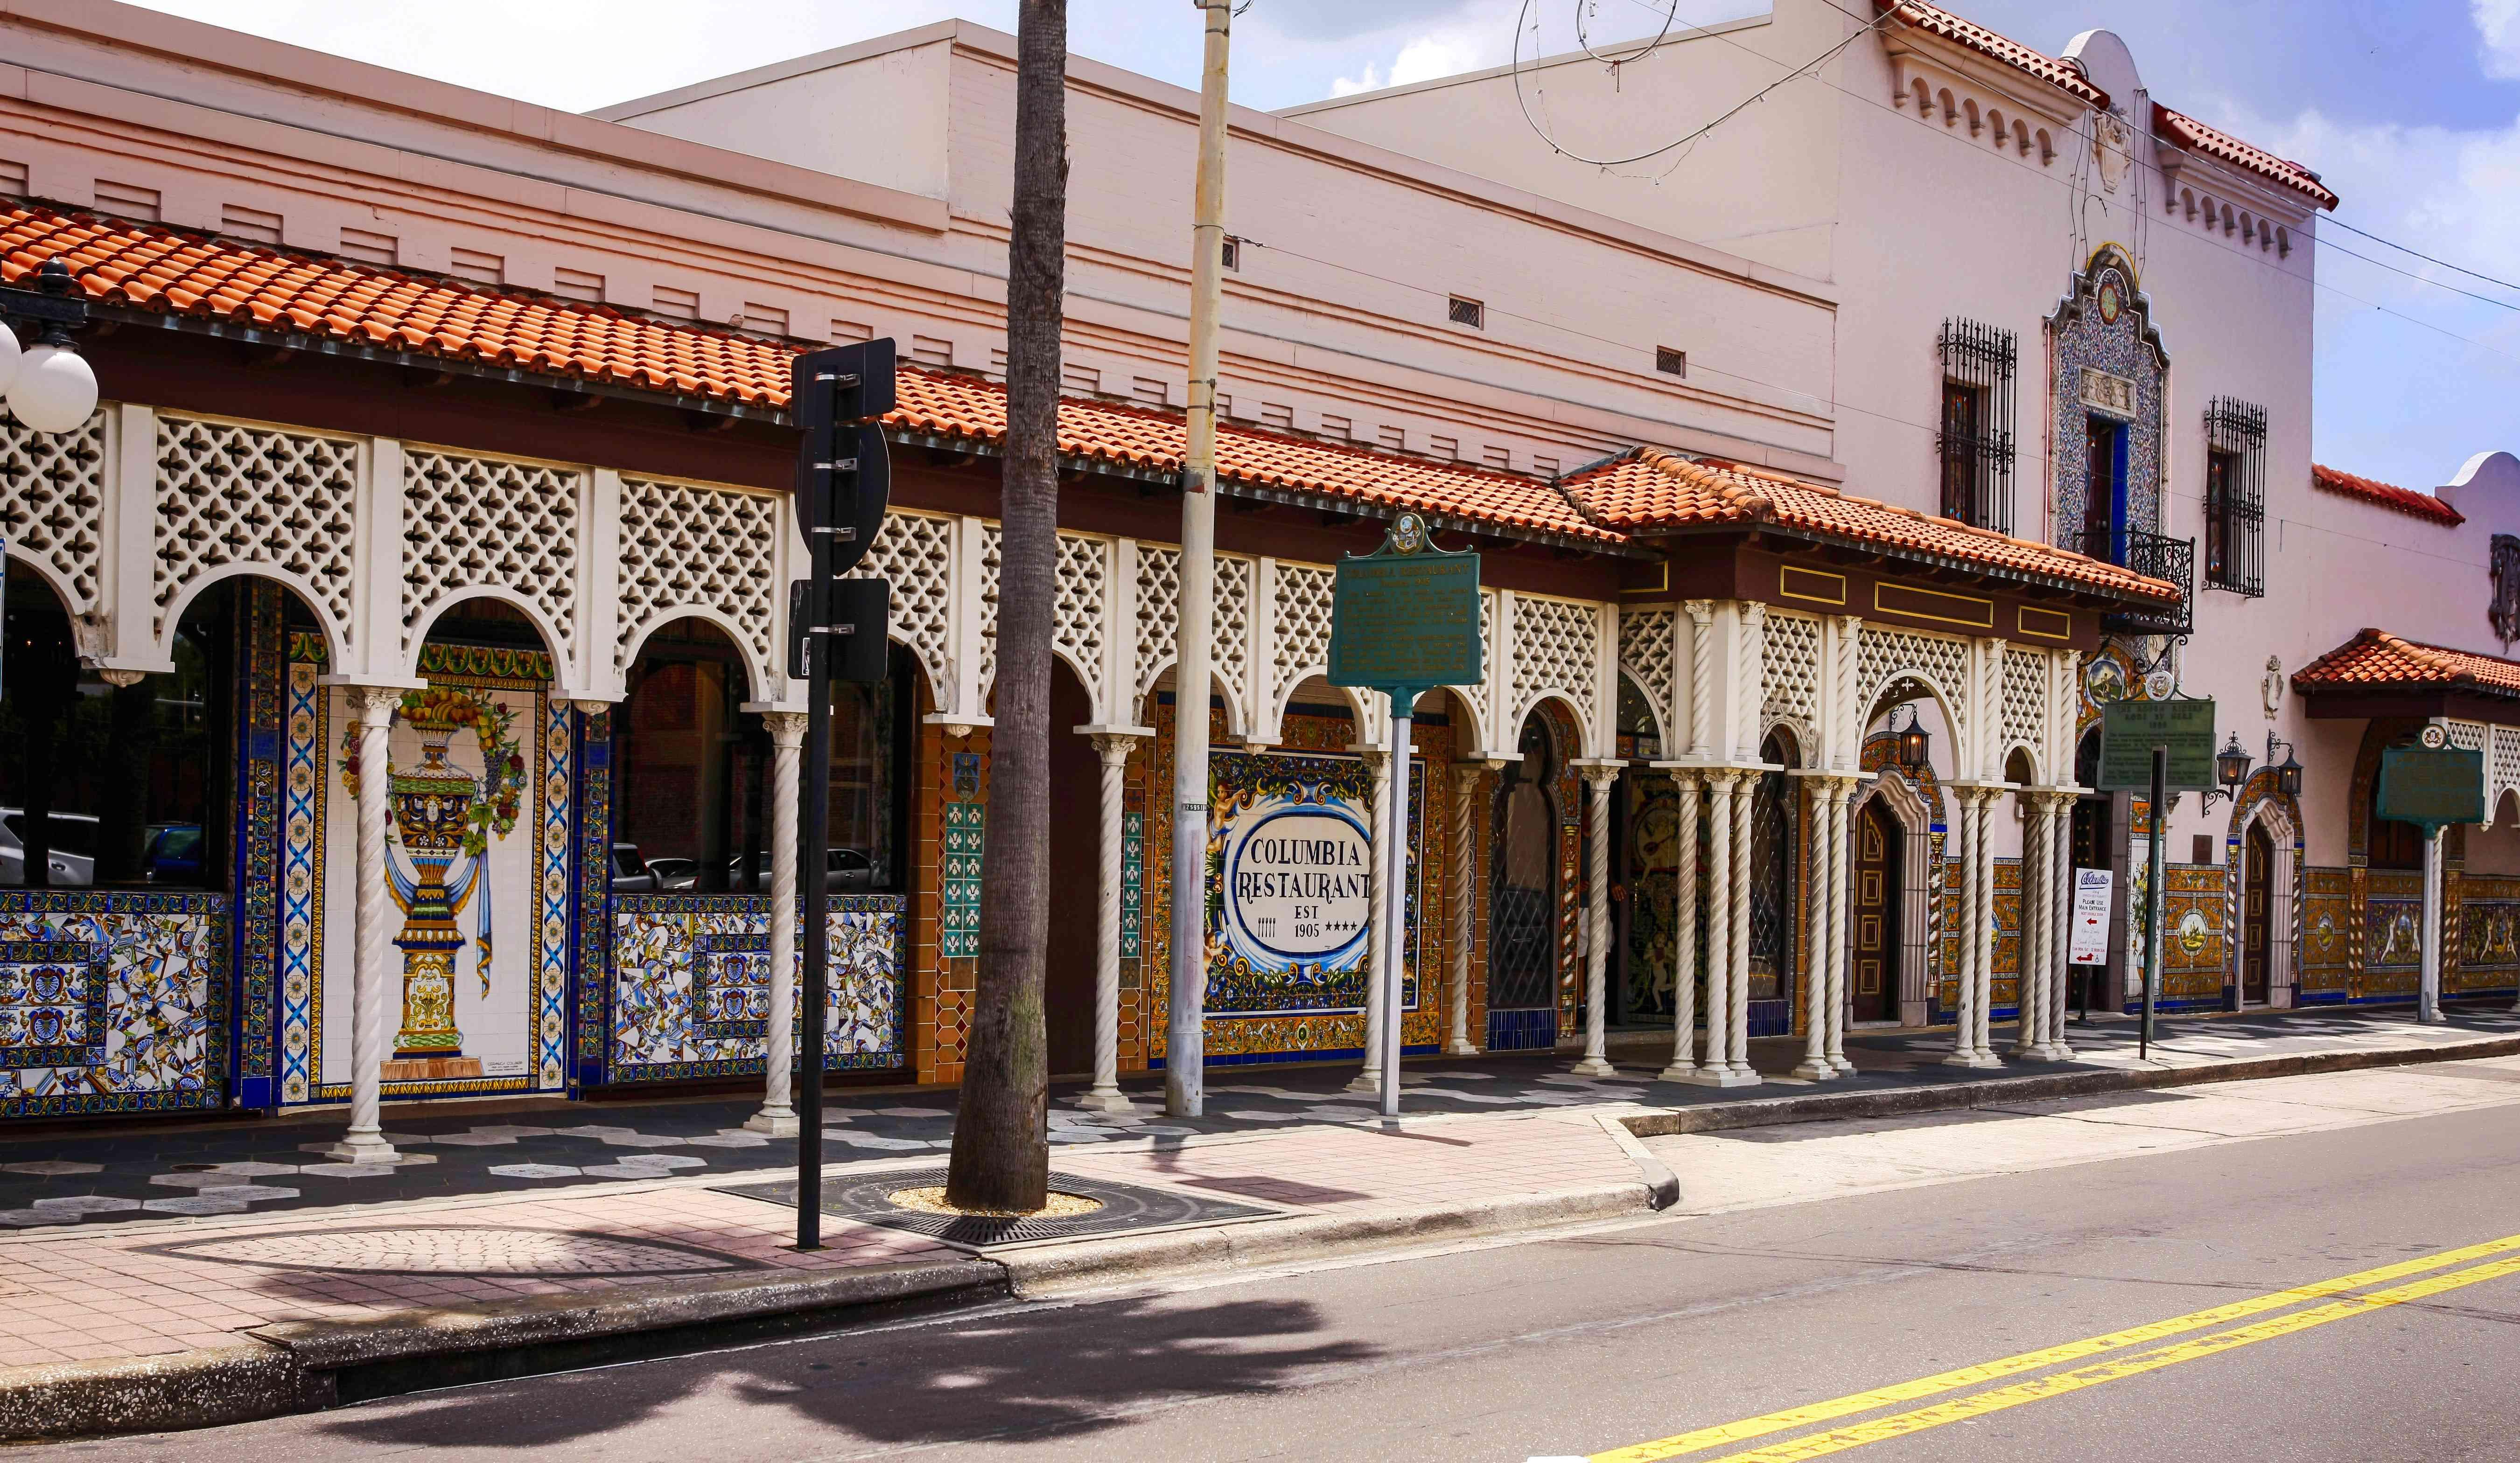 Hispanic style architecture in Ybor City in Tampa Florida, USA